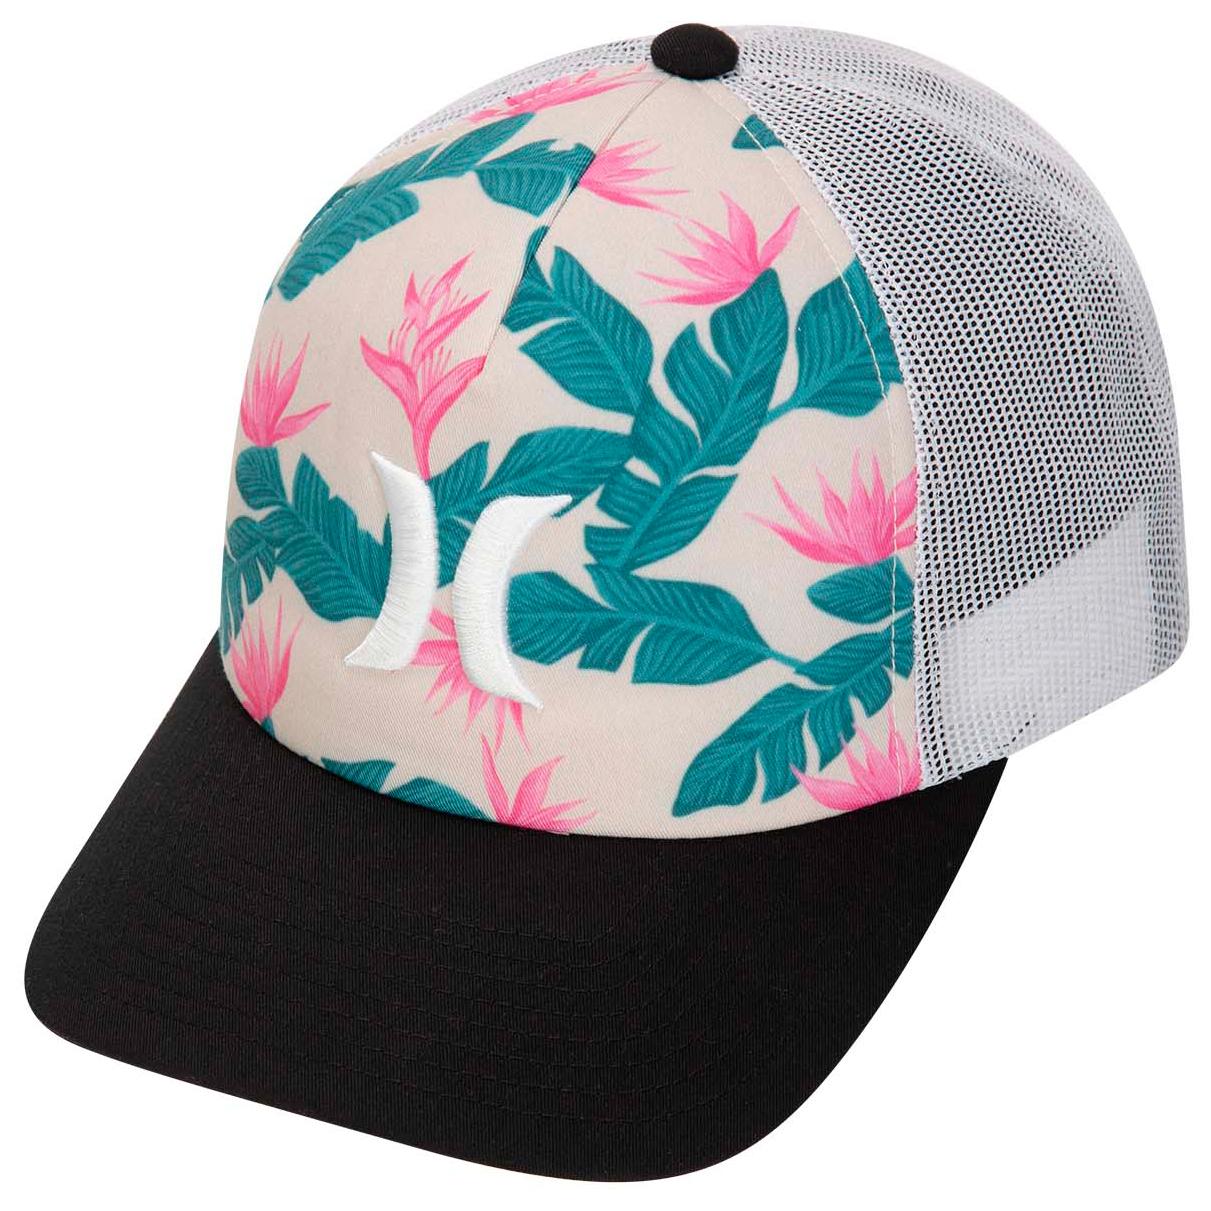 4ac2c6623 Hurley - Women's Hanoi Icon Trucker Hat - Cap - Crimson Tint   One Size